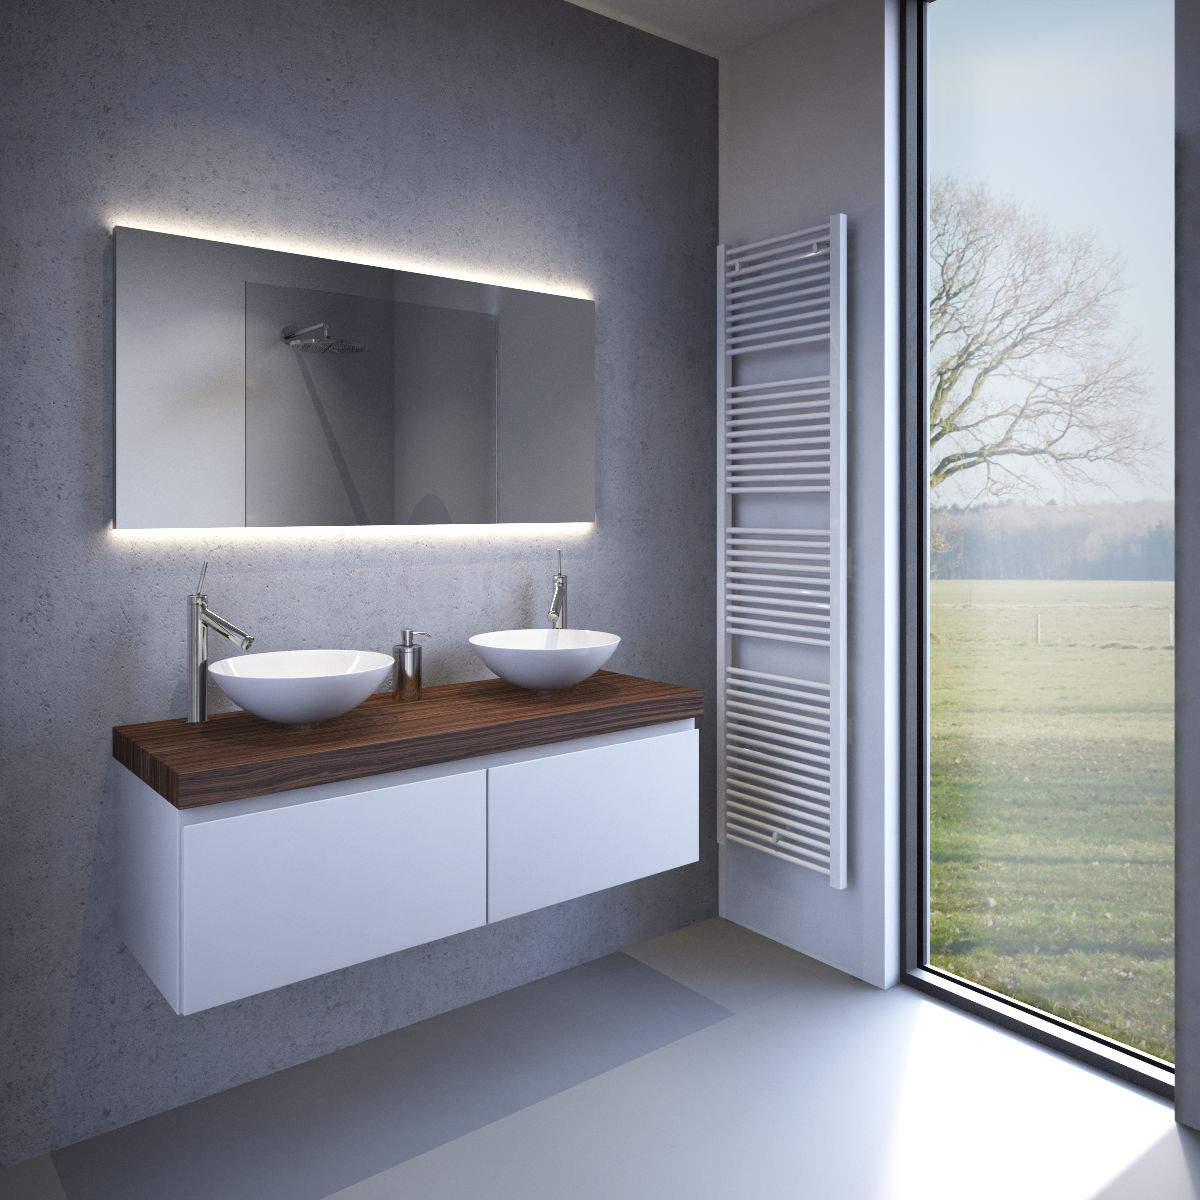 ... badkamer spiegel met strijklicht en spiegelverwarming 120u00d760 cm